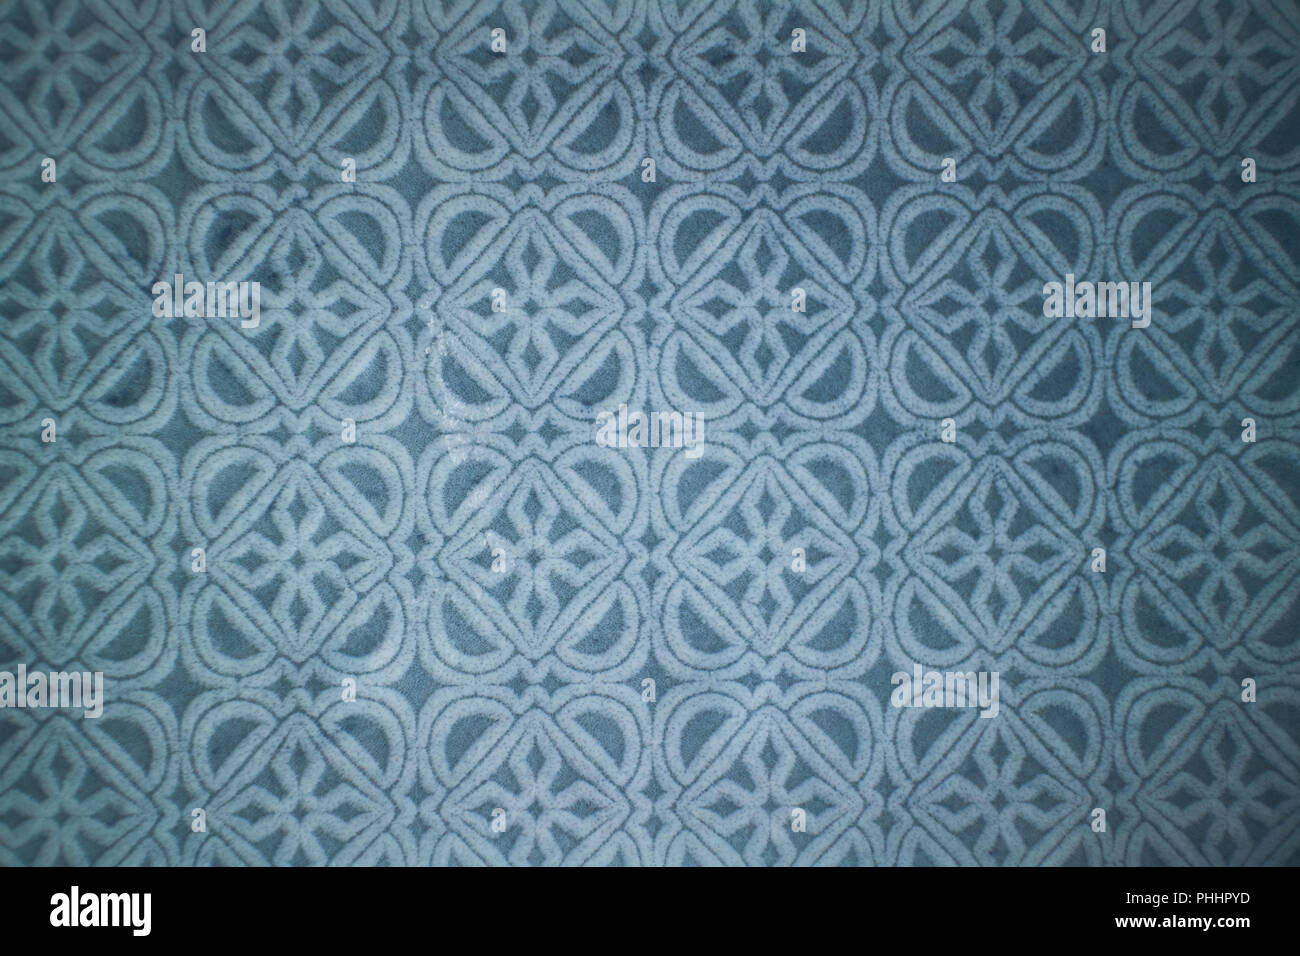 Ceramic blue tile with decorative pattern. - Stock Image